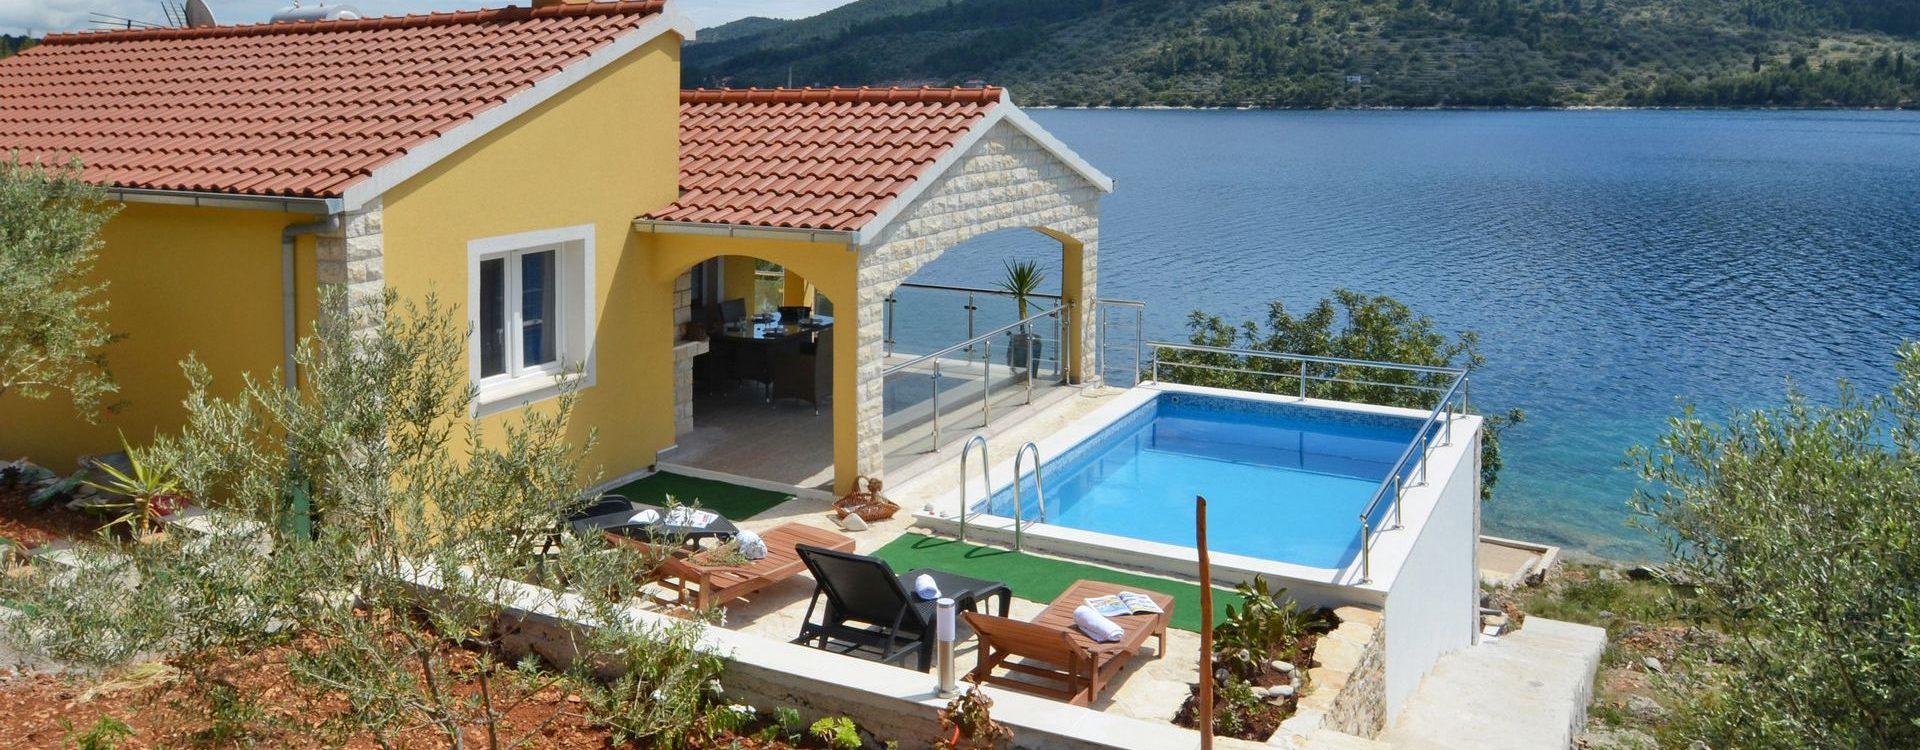 Kuća 2 – Vela Luka Paradise